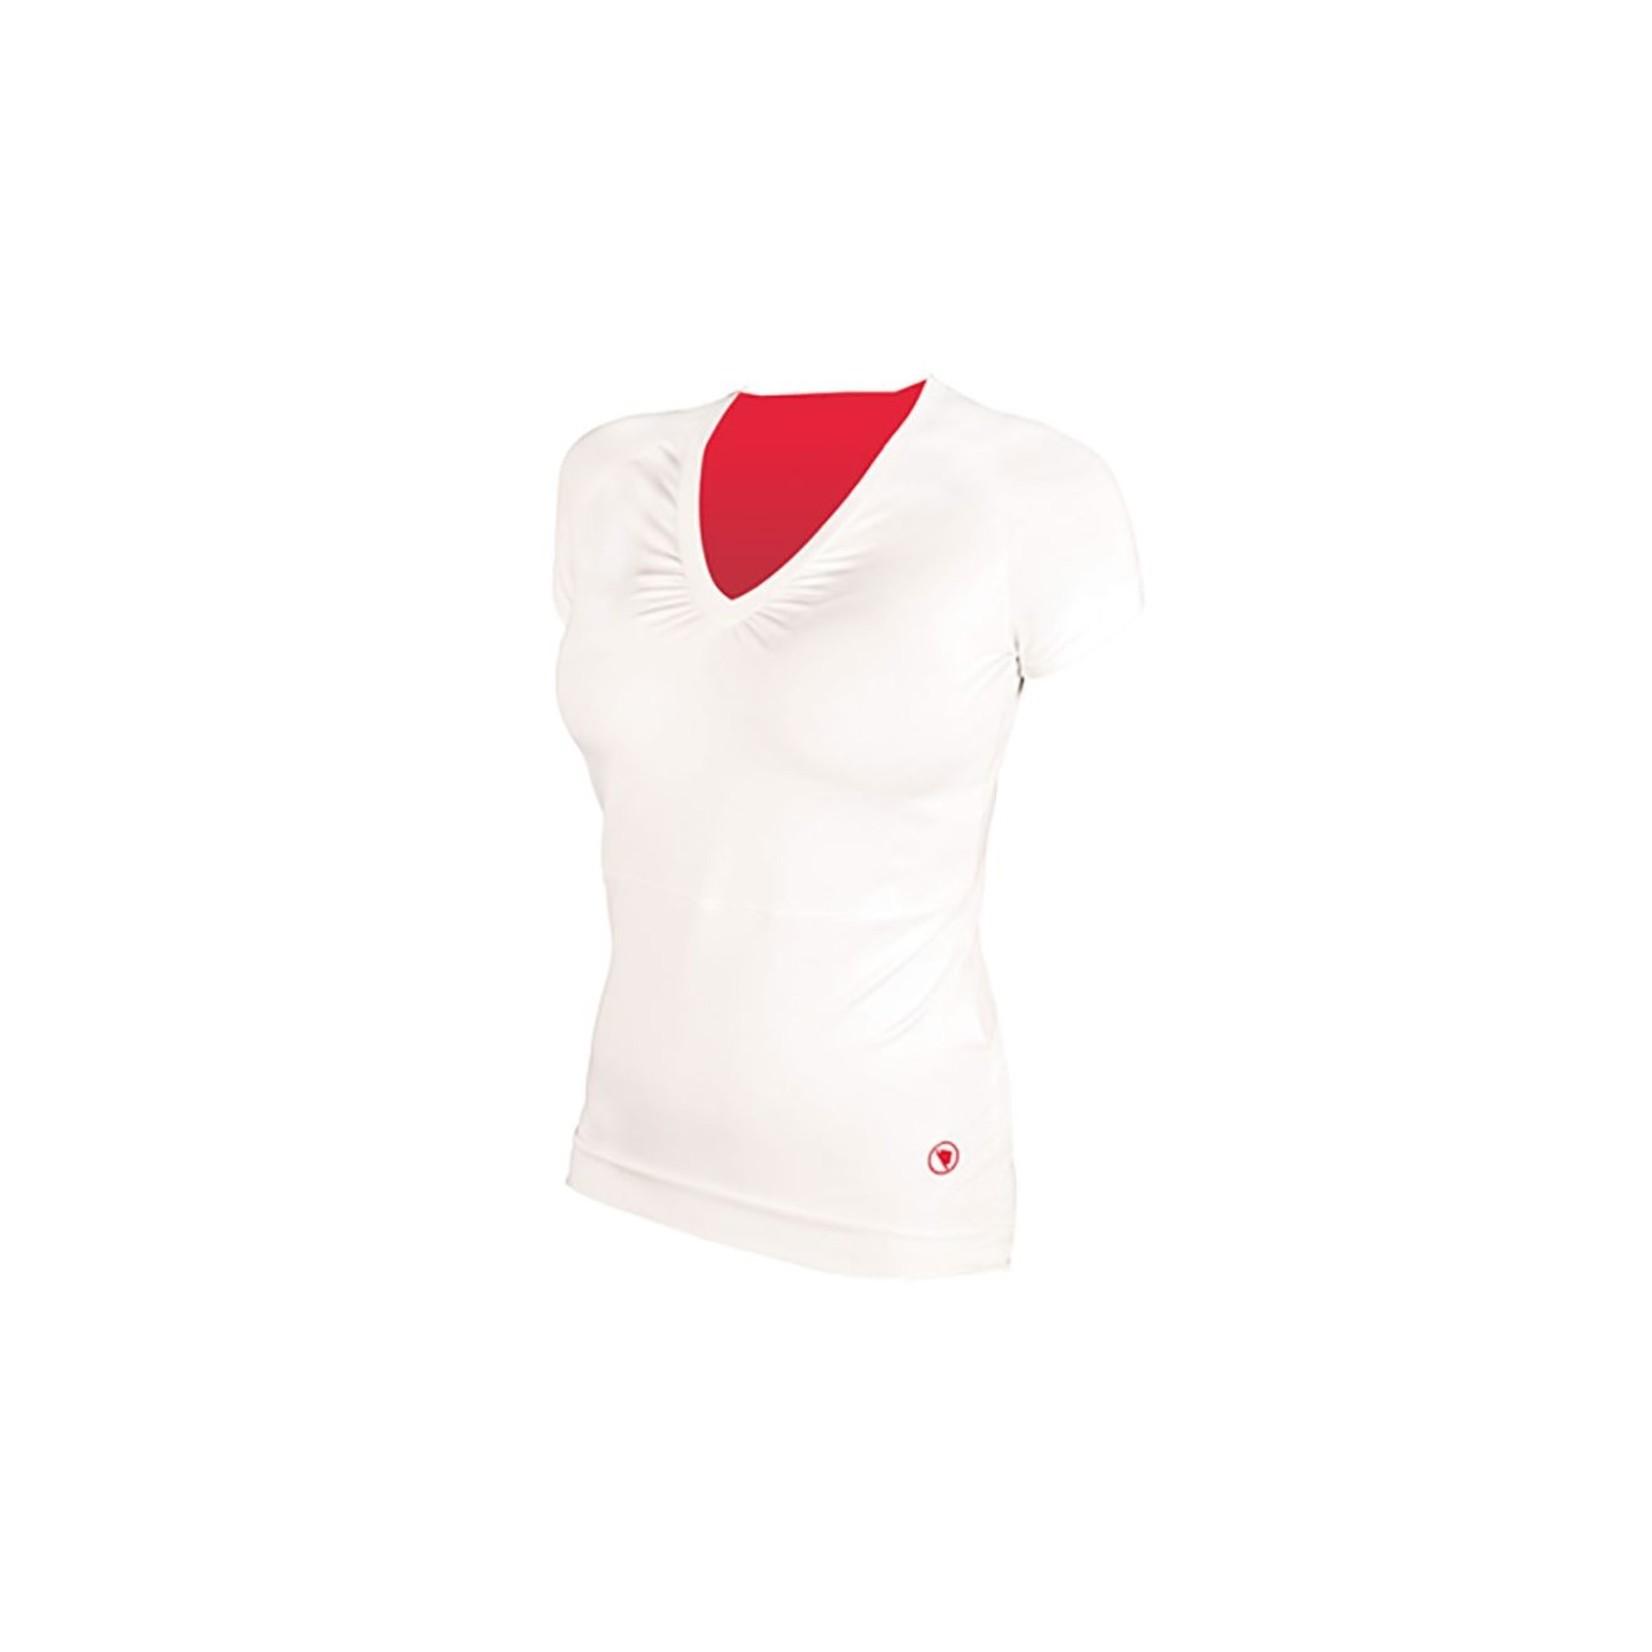 Endura Women's V Sport T-Shirt White Large